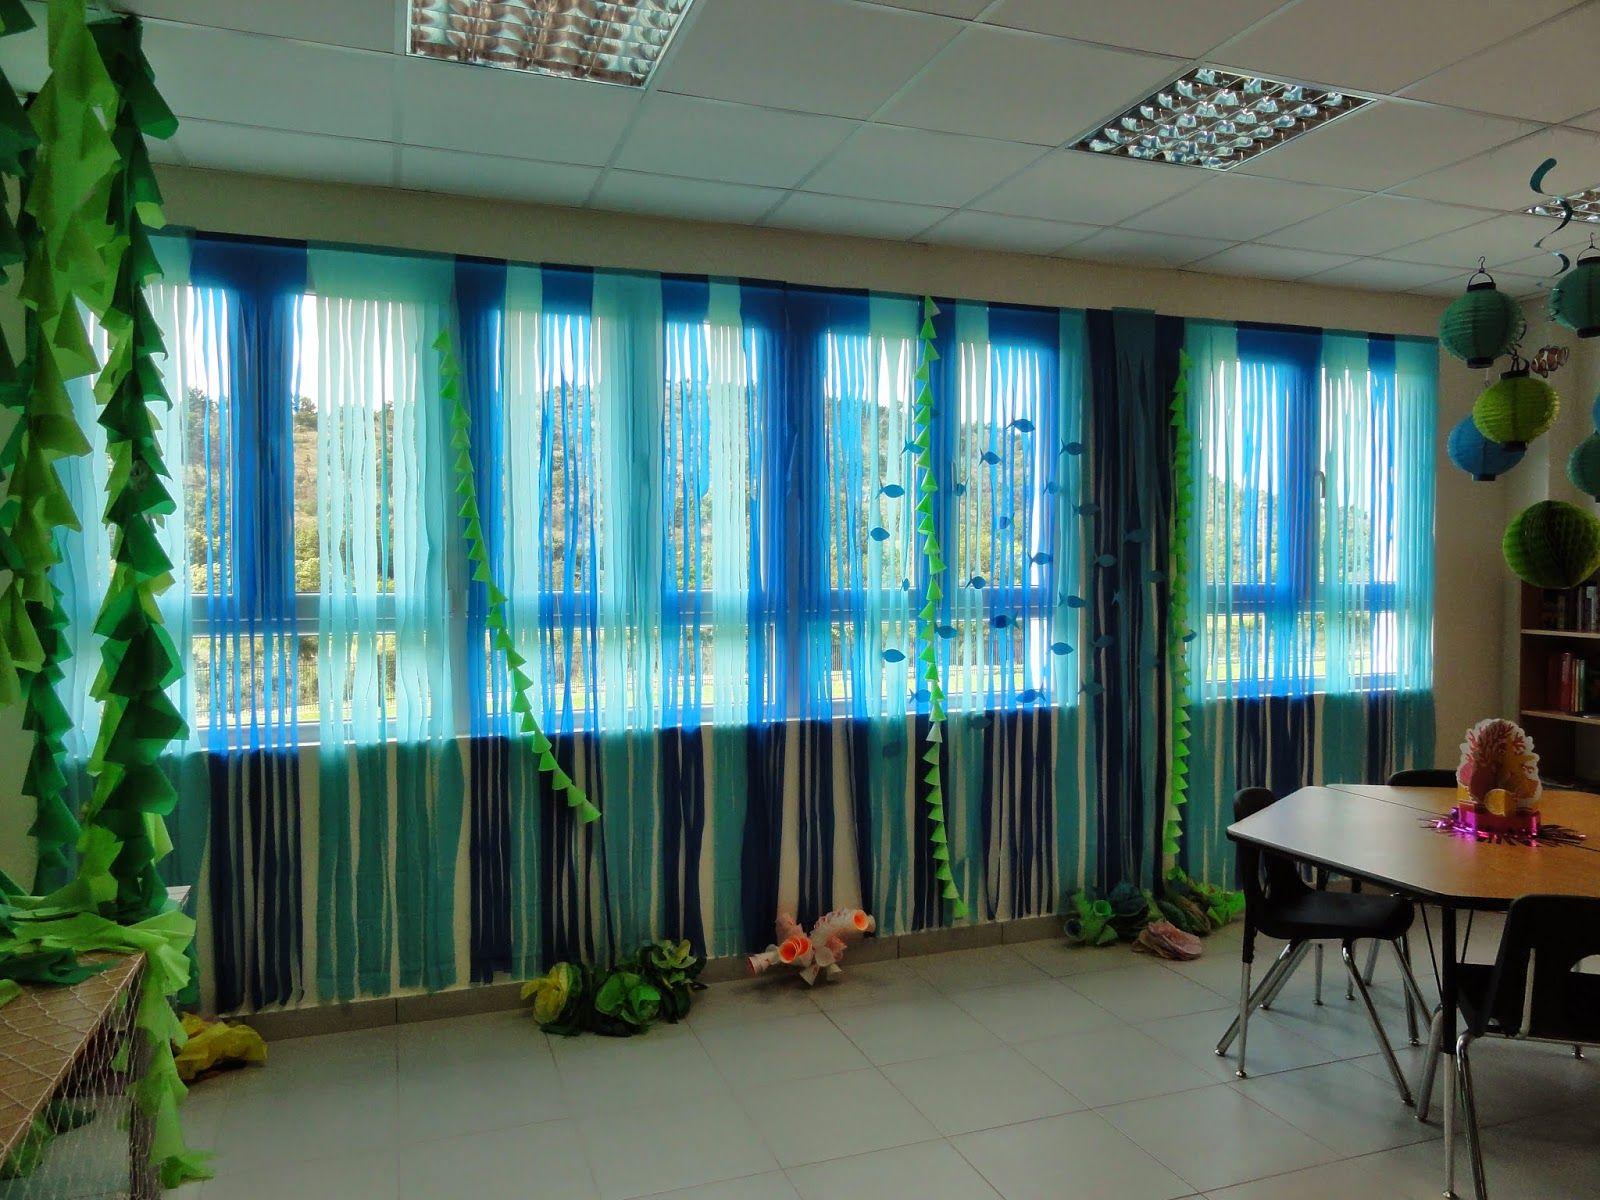 Ocean Decoration For Classroom : Ocean themed classroom the charming vbs